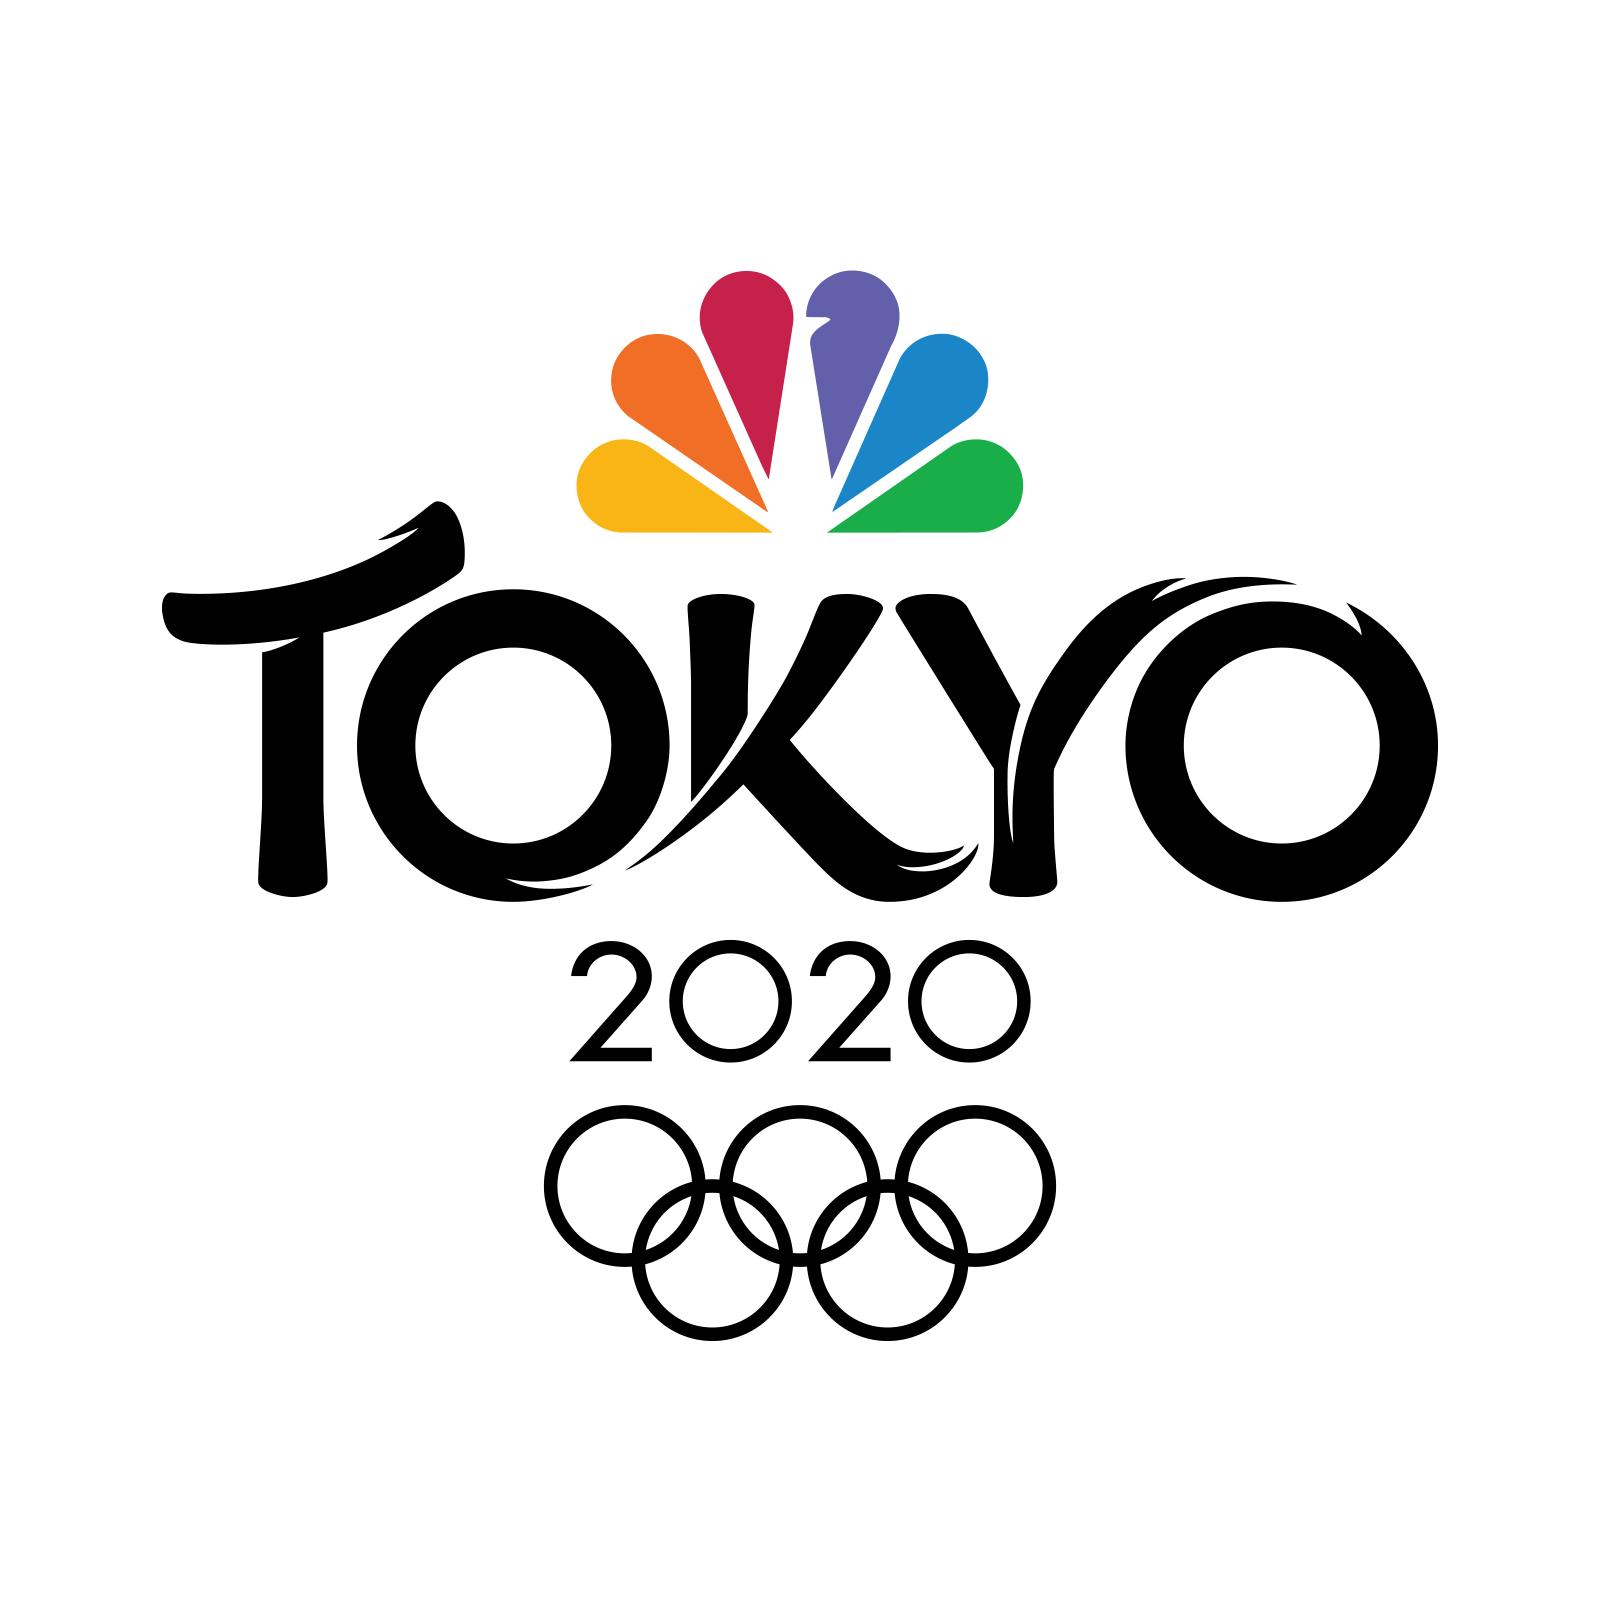 Olympic rights-holder NBC has predicted record advertising sales at Tokyo 2020 ©NBC